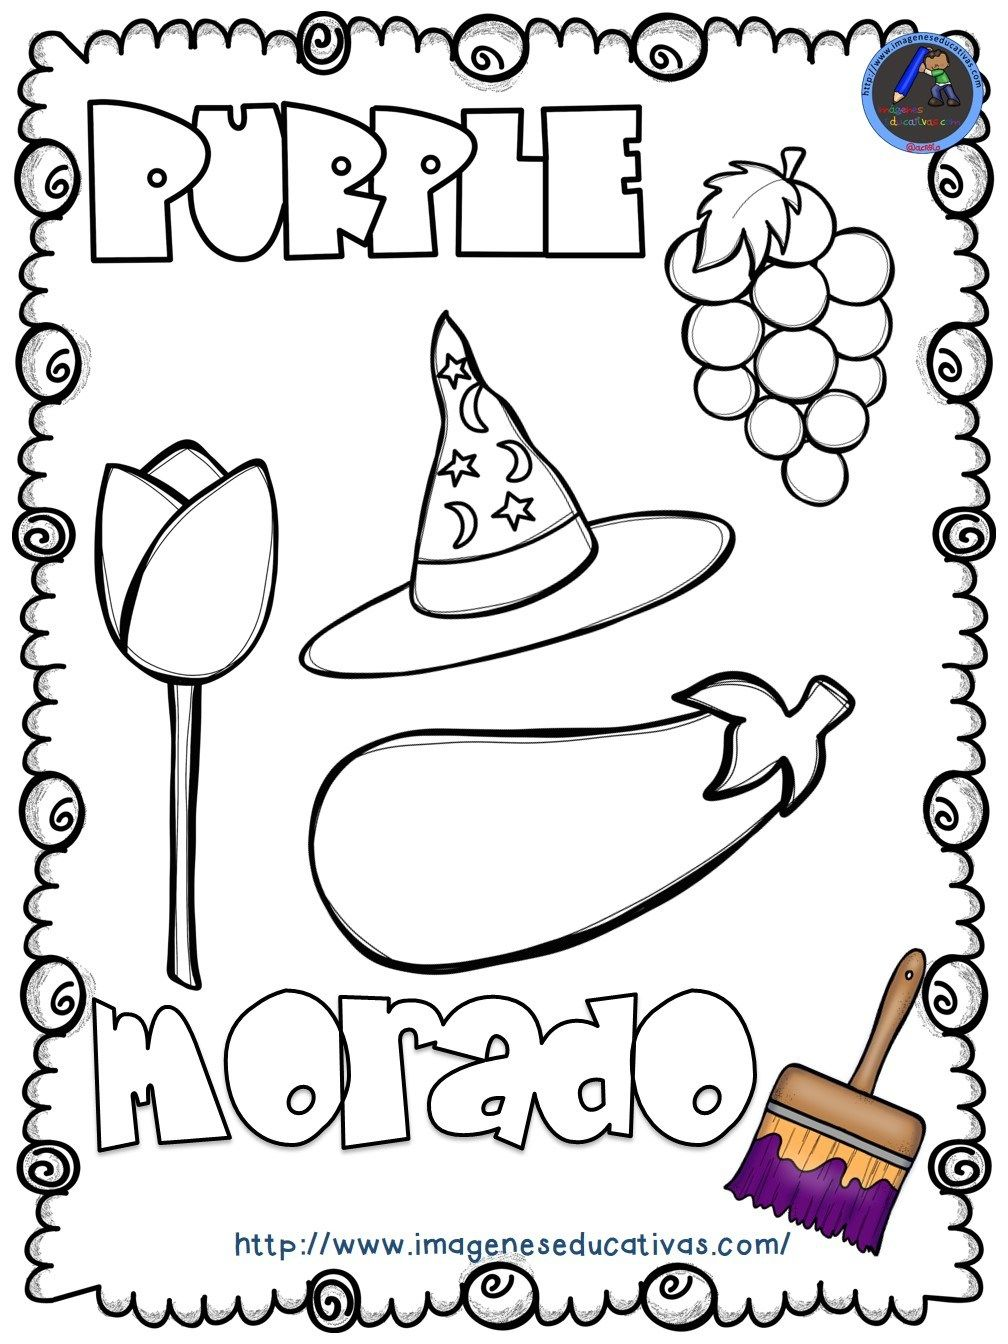 Pin von Claudia Ramirez Cisneros auf Prekinder | Pinterest